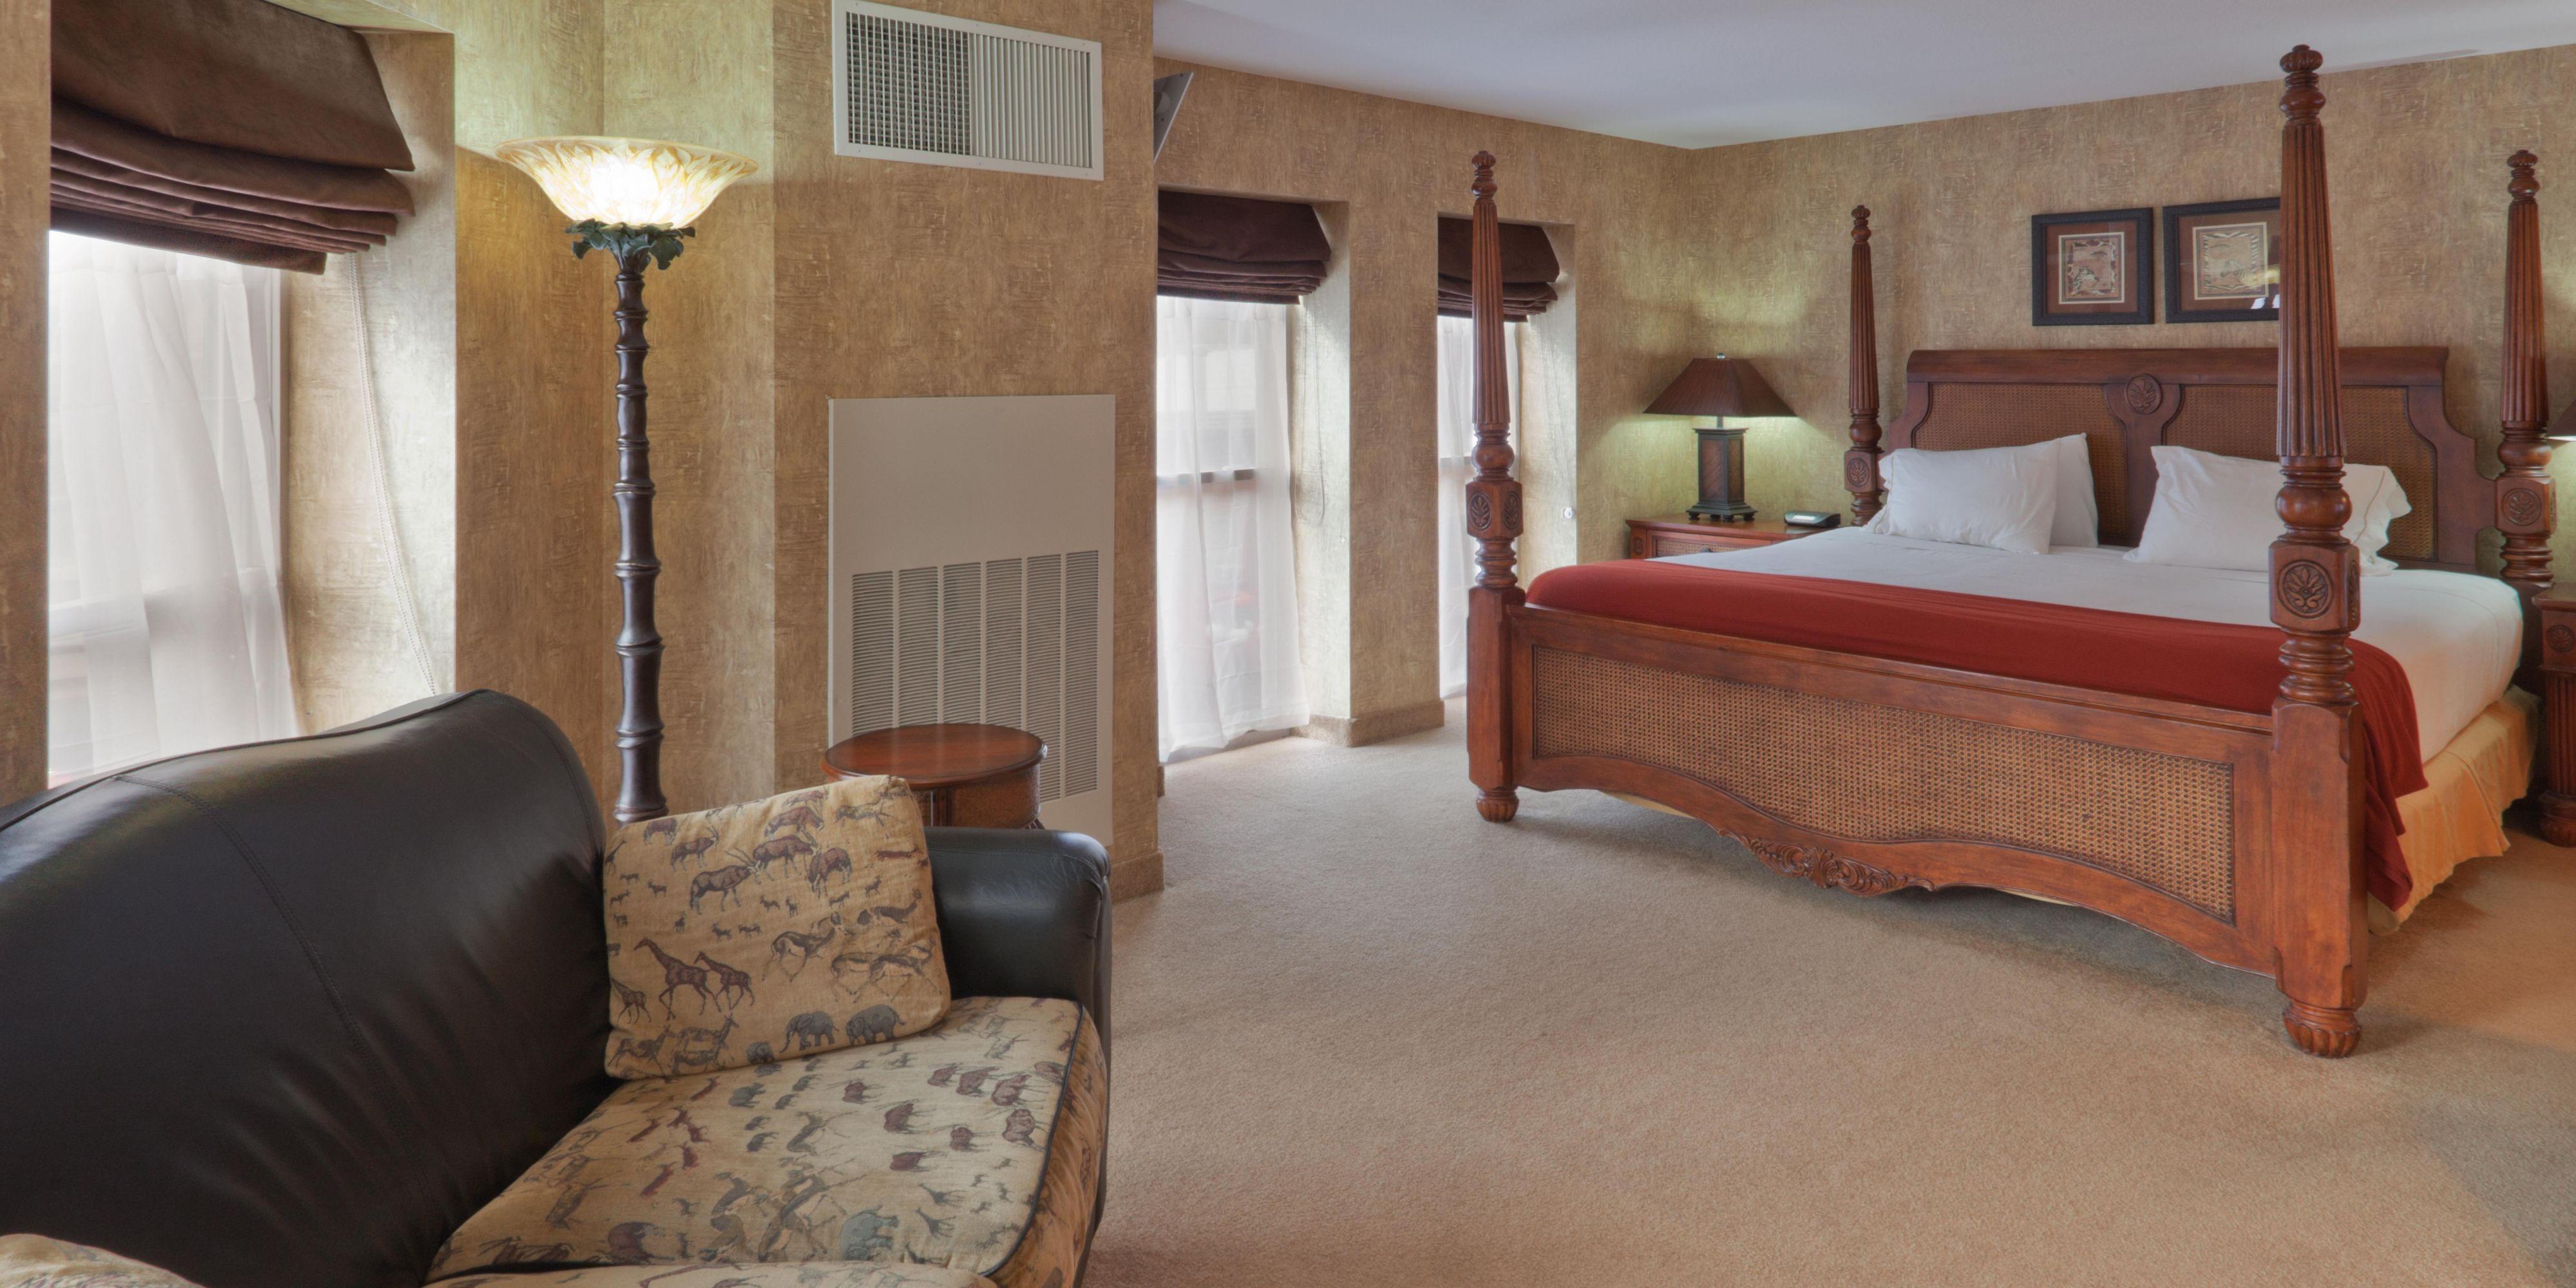 Casino deadwood dust gold hotel suite hilton casino in atlantic city nj